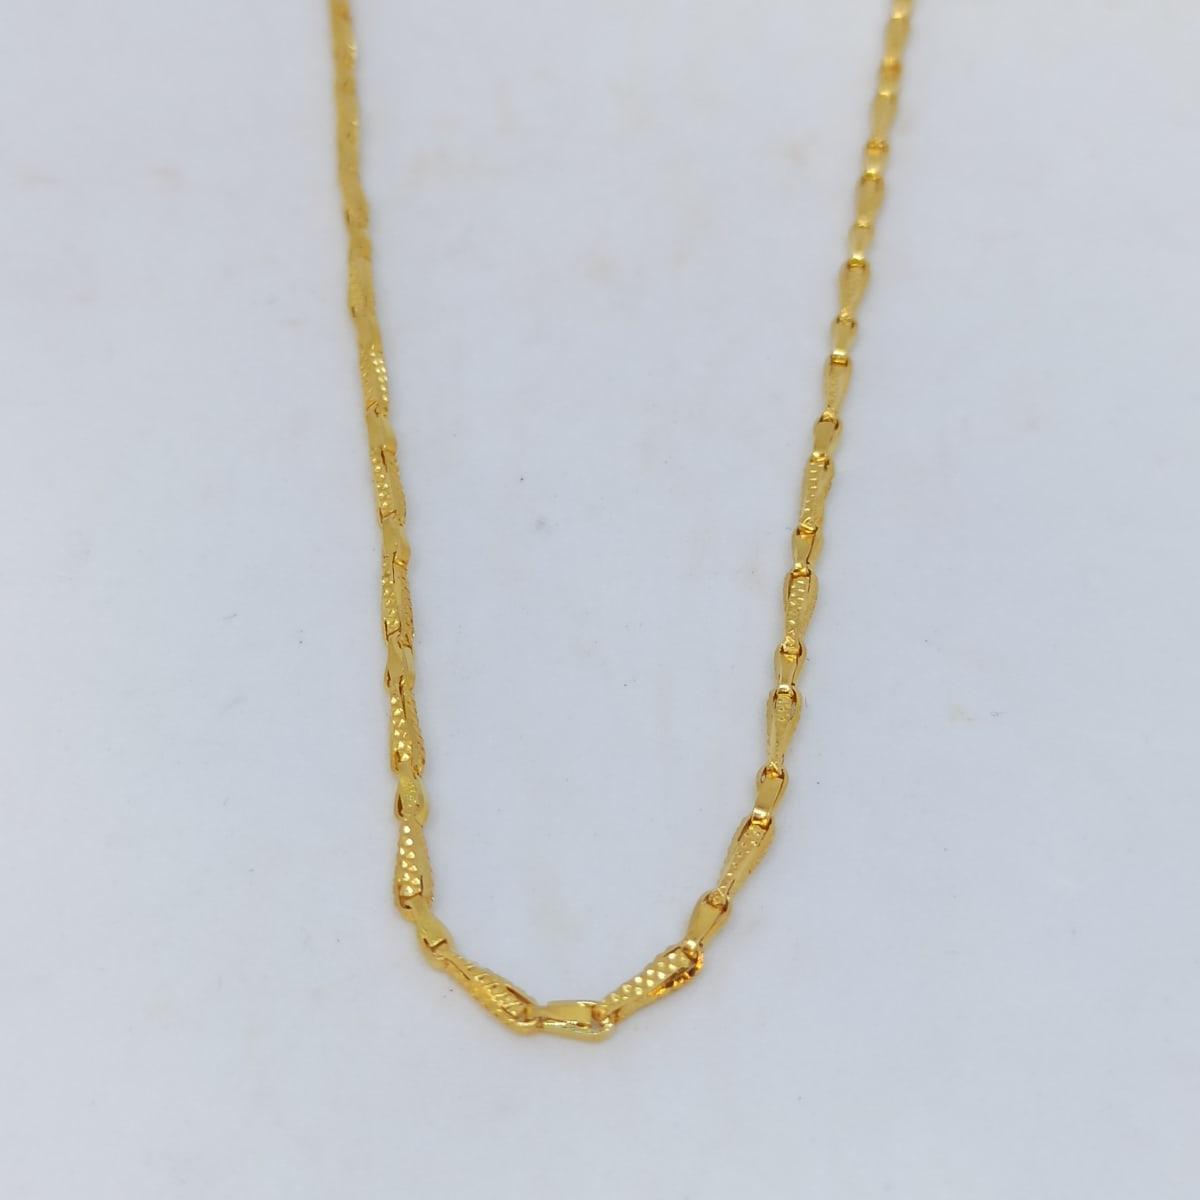 Aisha Chain For Her